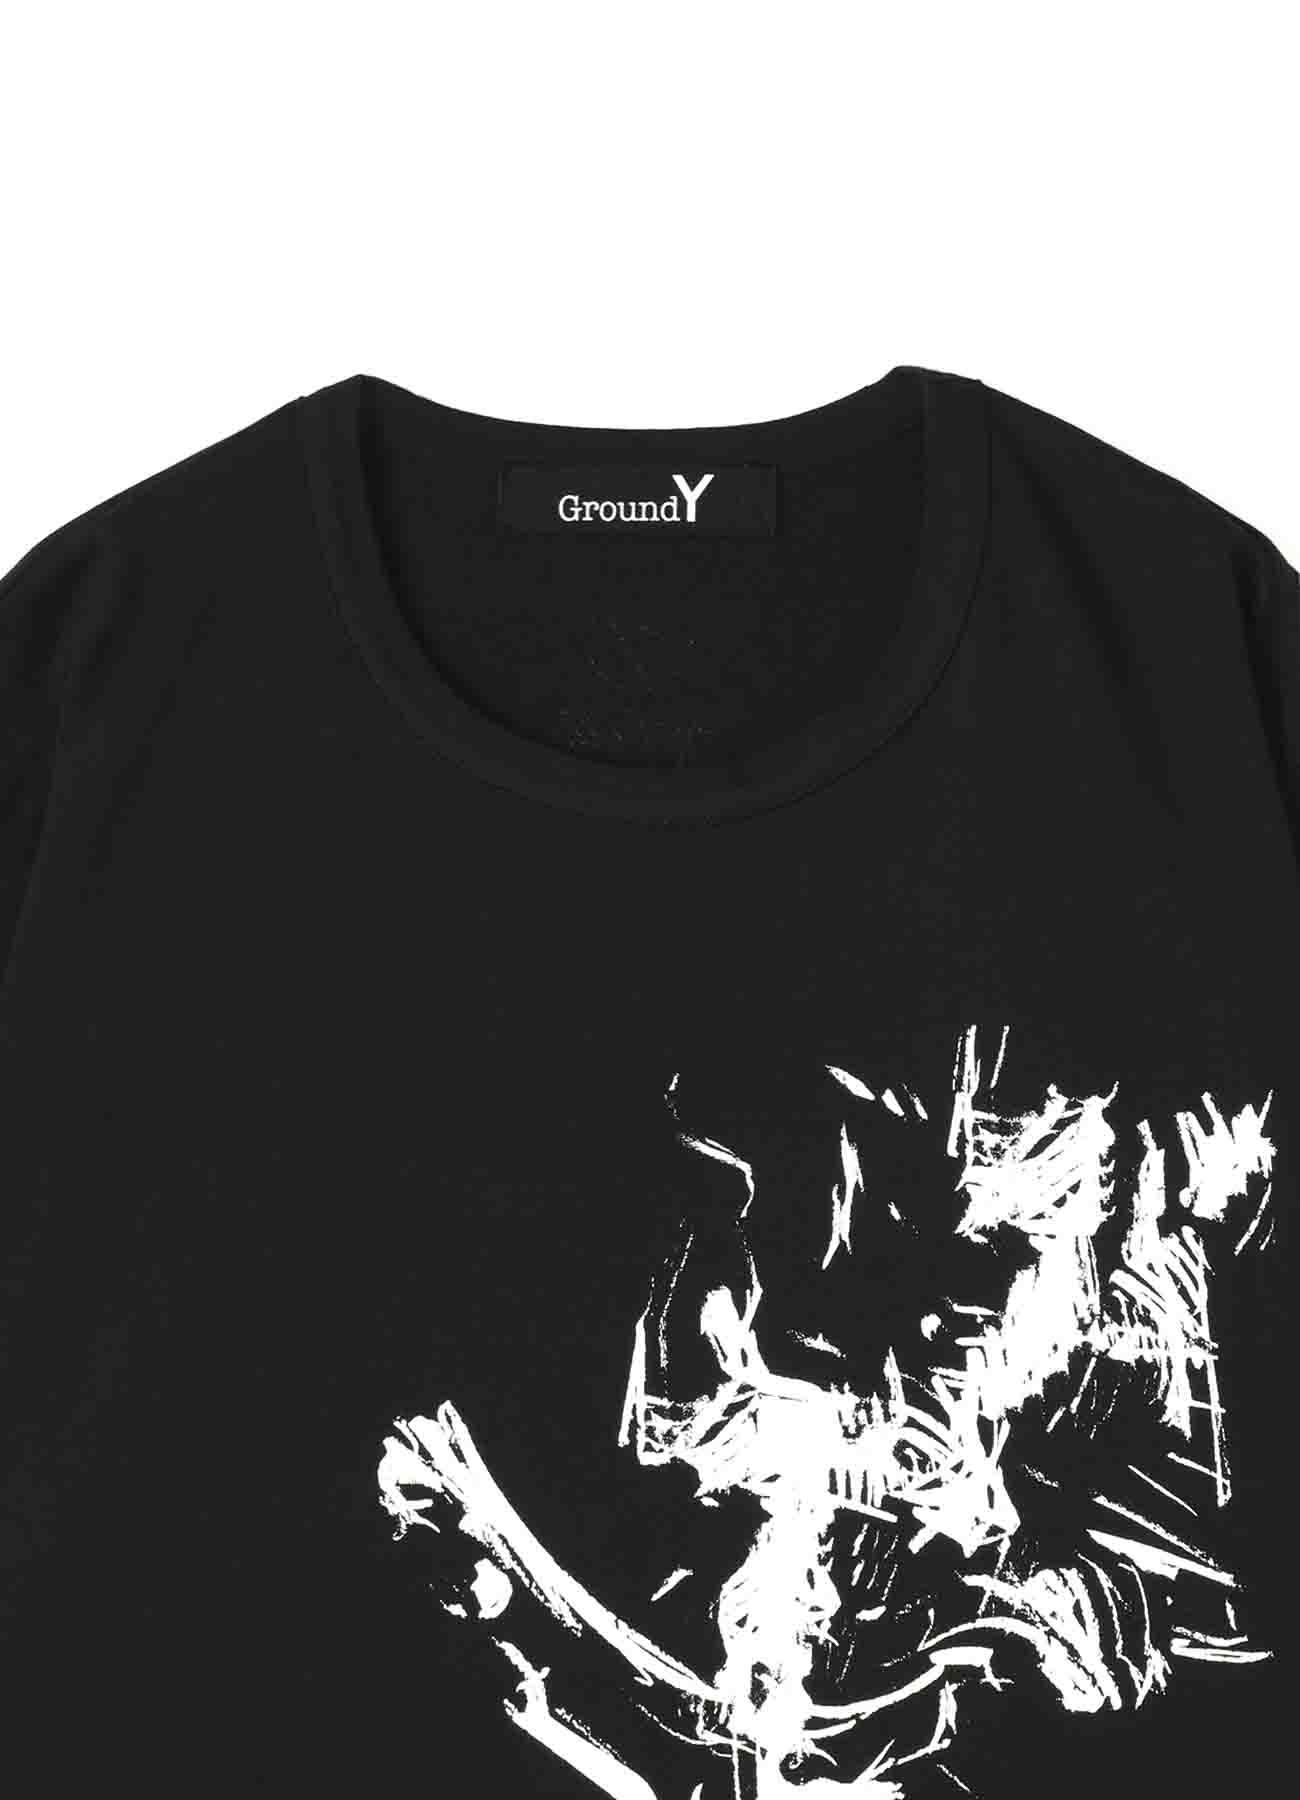 Ground Y×SCANDAL Collaboration 【TOMOMI】Tshirt